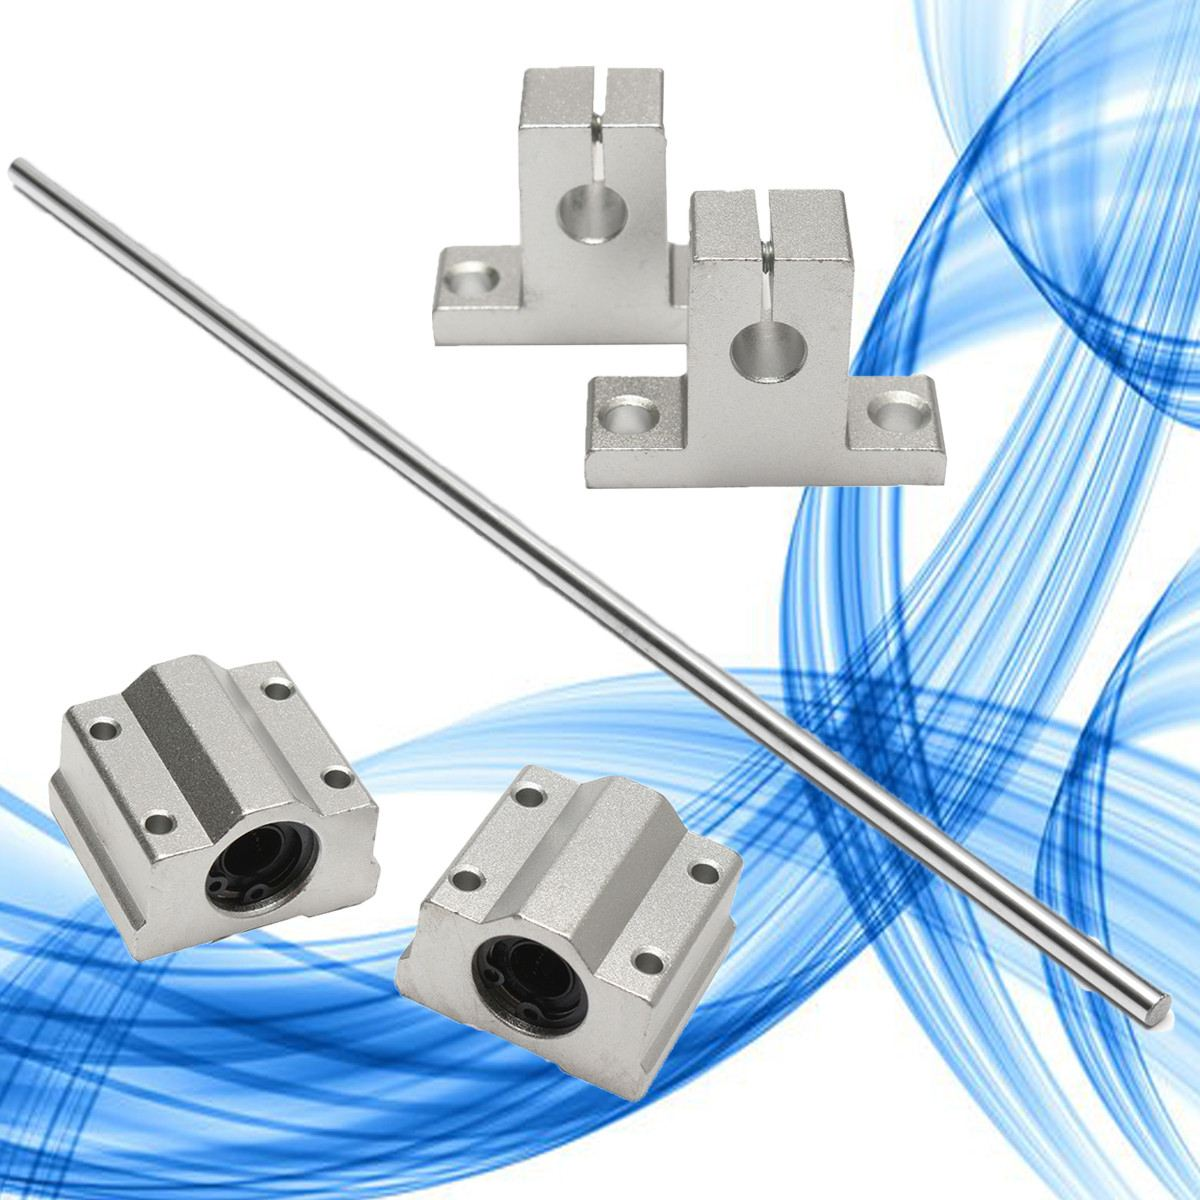 1Pcs Stainless Steel 8x500mm Linear Shaft Optical Axis Silver + 2pcs Aluminum Rail Shaft Support + 2pcs Linear Slide Block